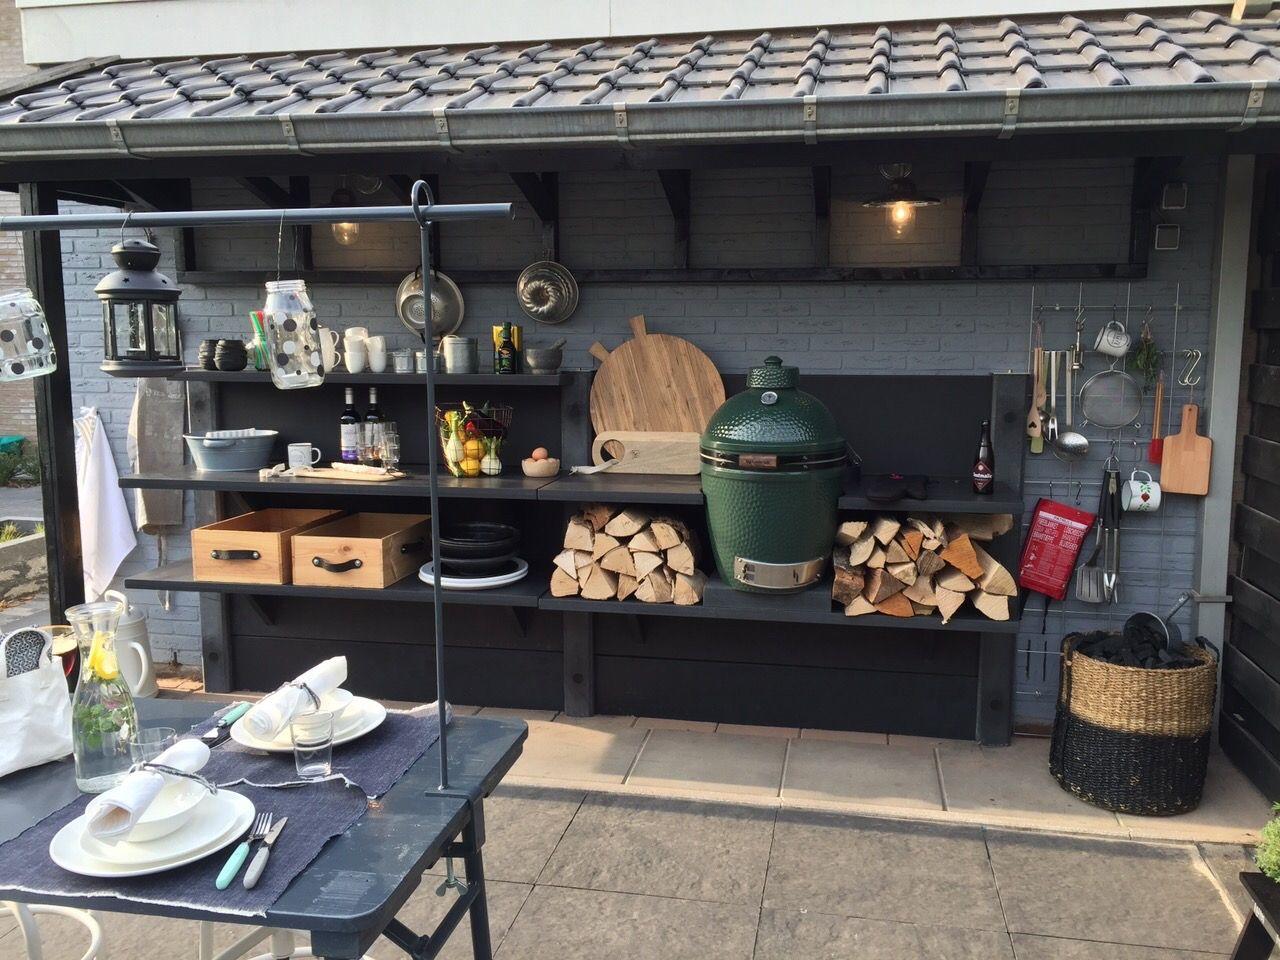 wwoo outdoor kitchen garden pinterest garten im freien outdoor k che. Black Bedroom Furniture Sets. Home Design Ideas